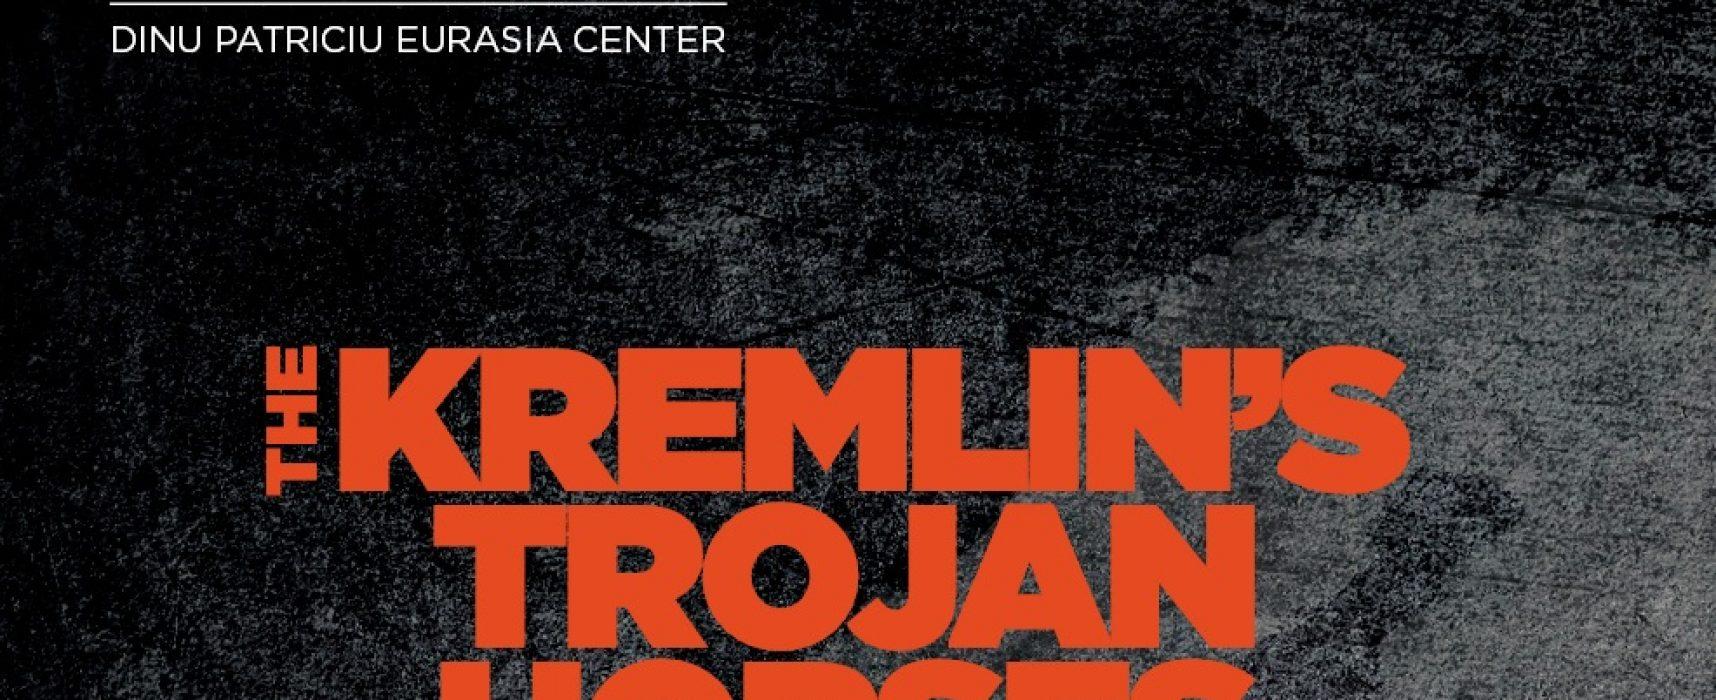 The Kremlin's Trojan Horses